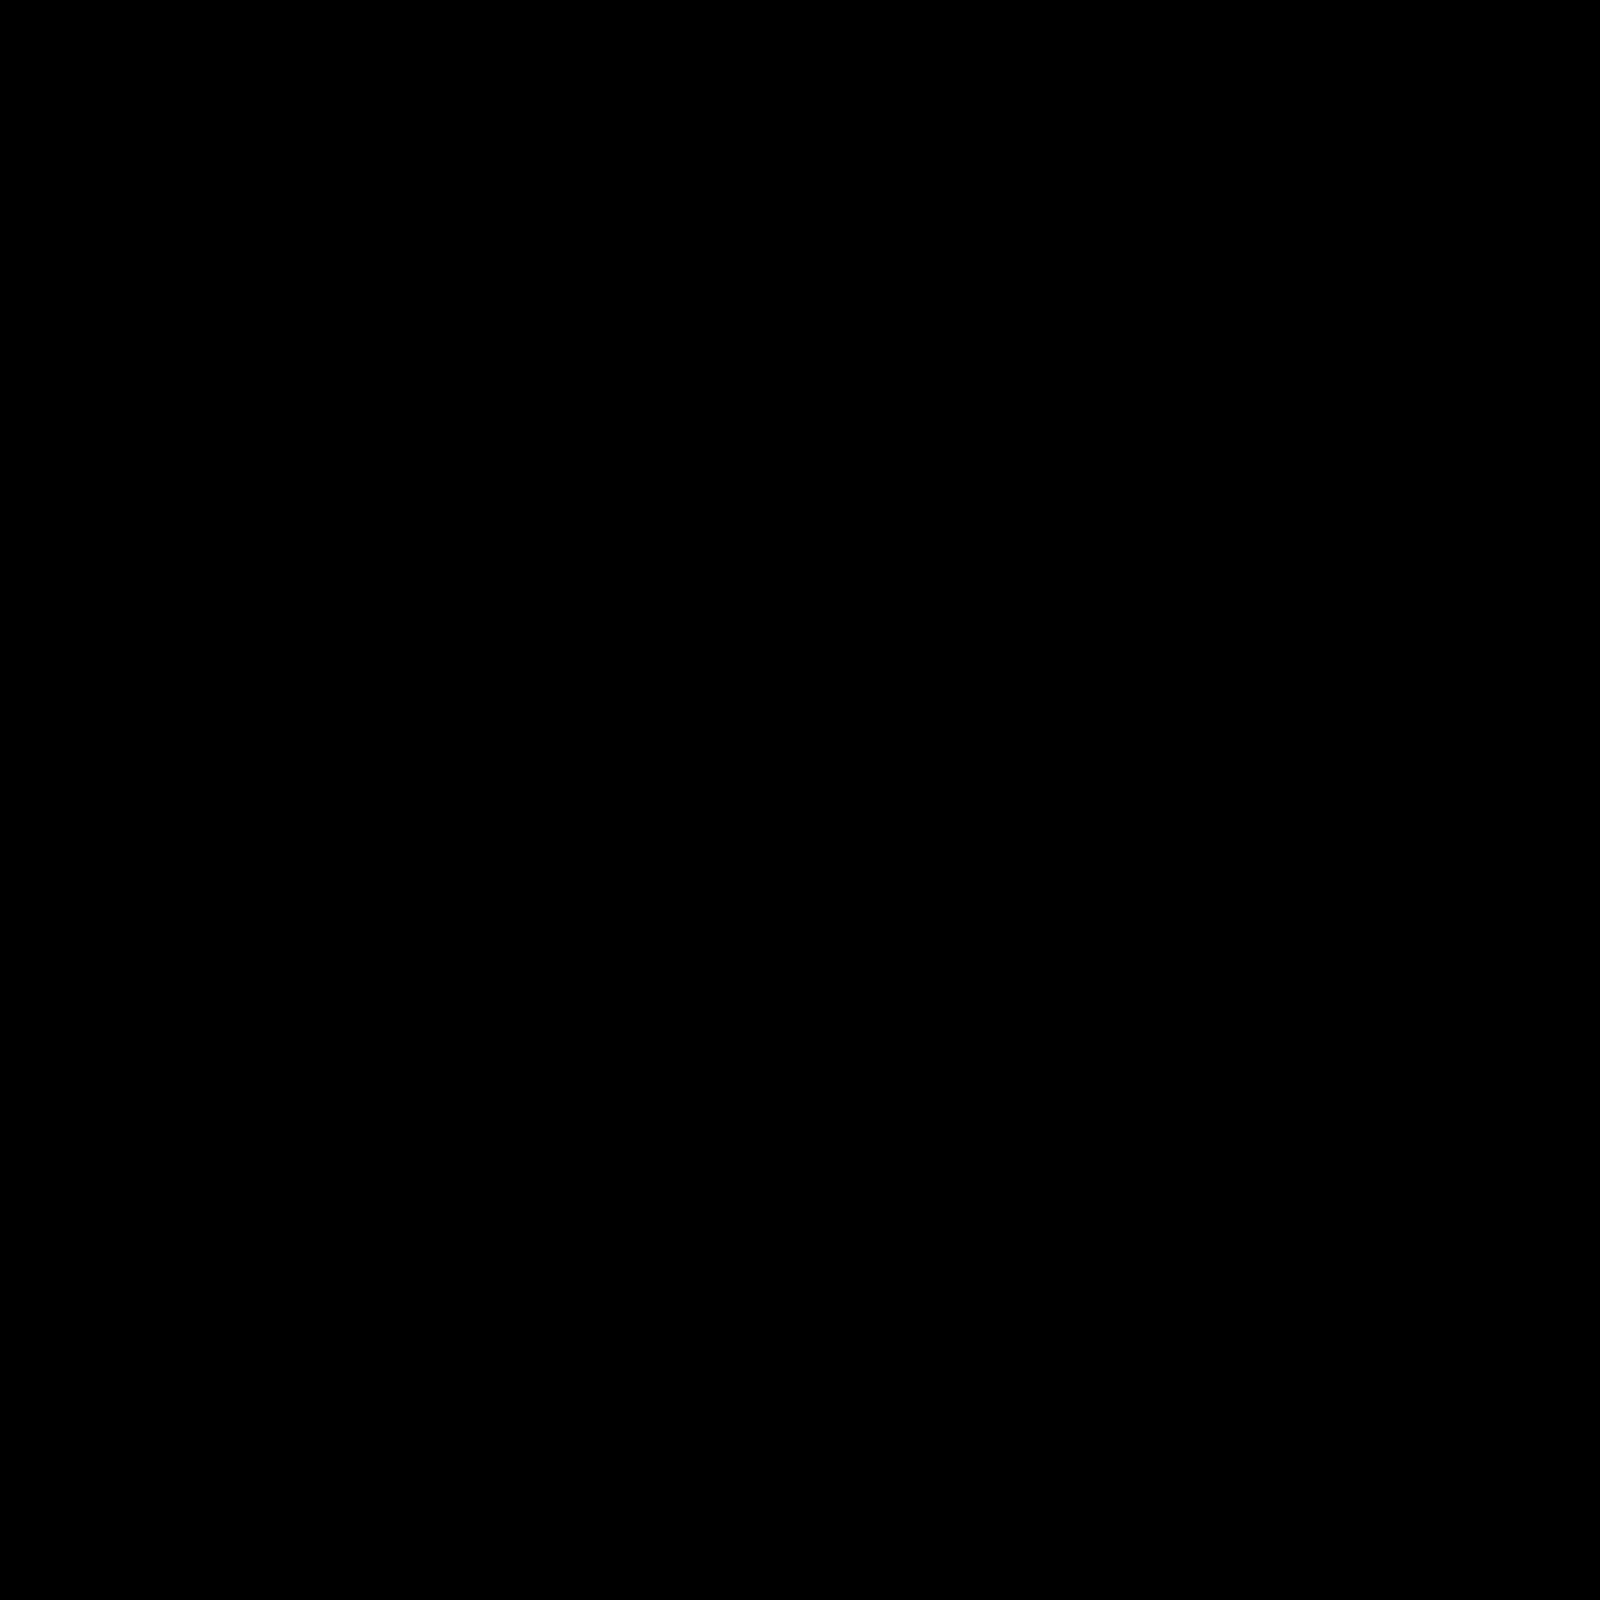 Twitter (丸型) icon